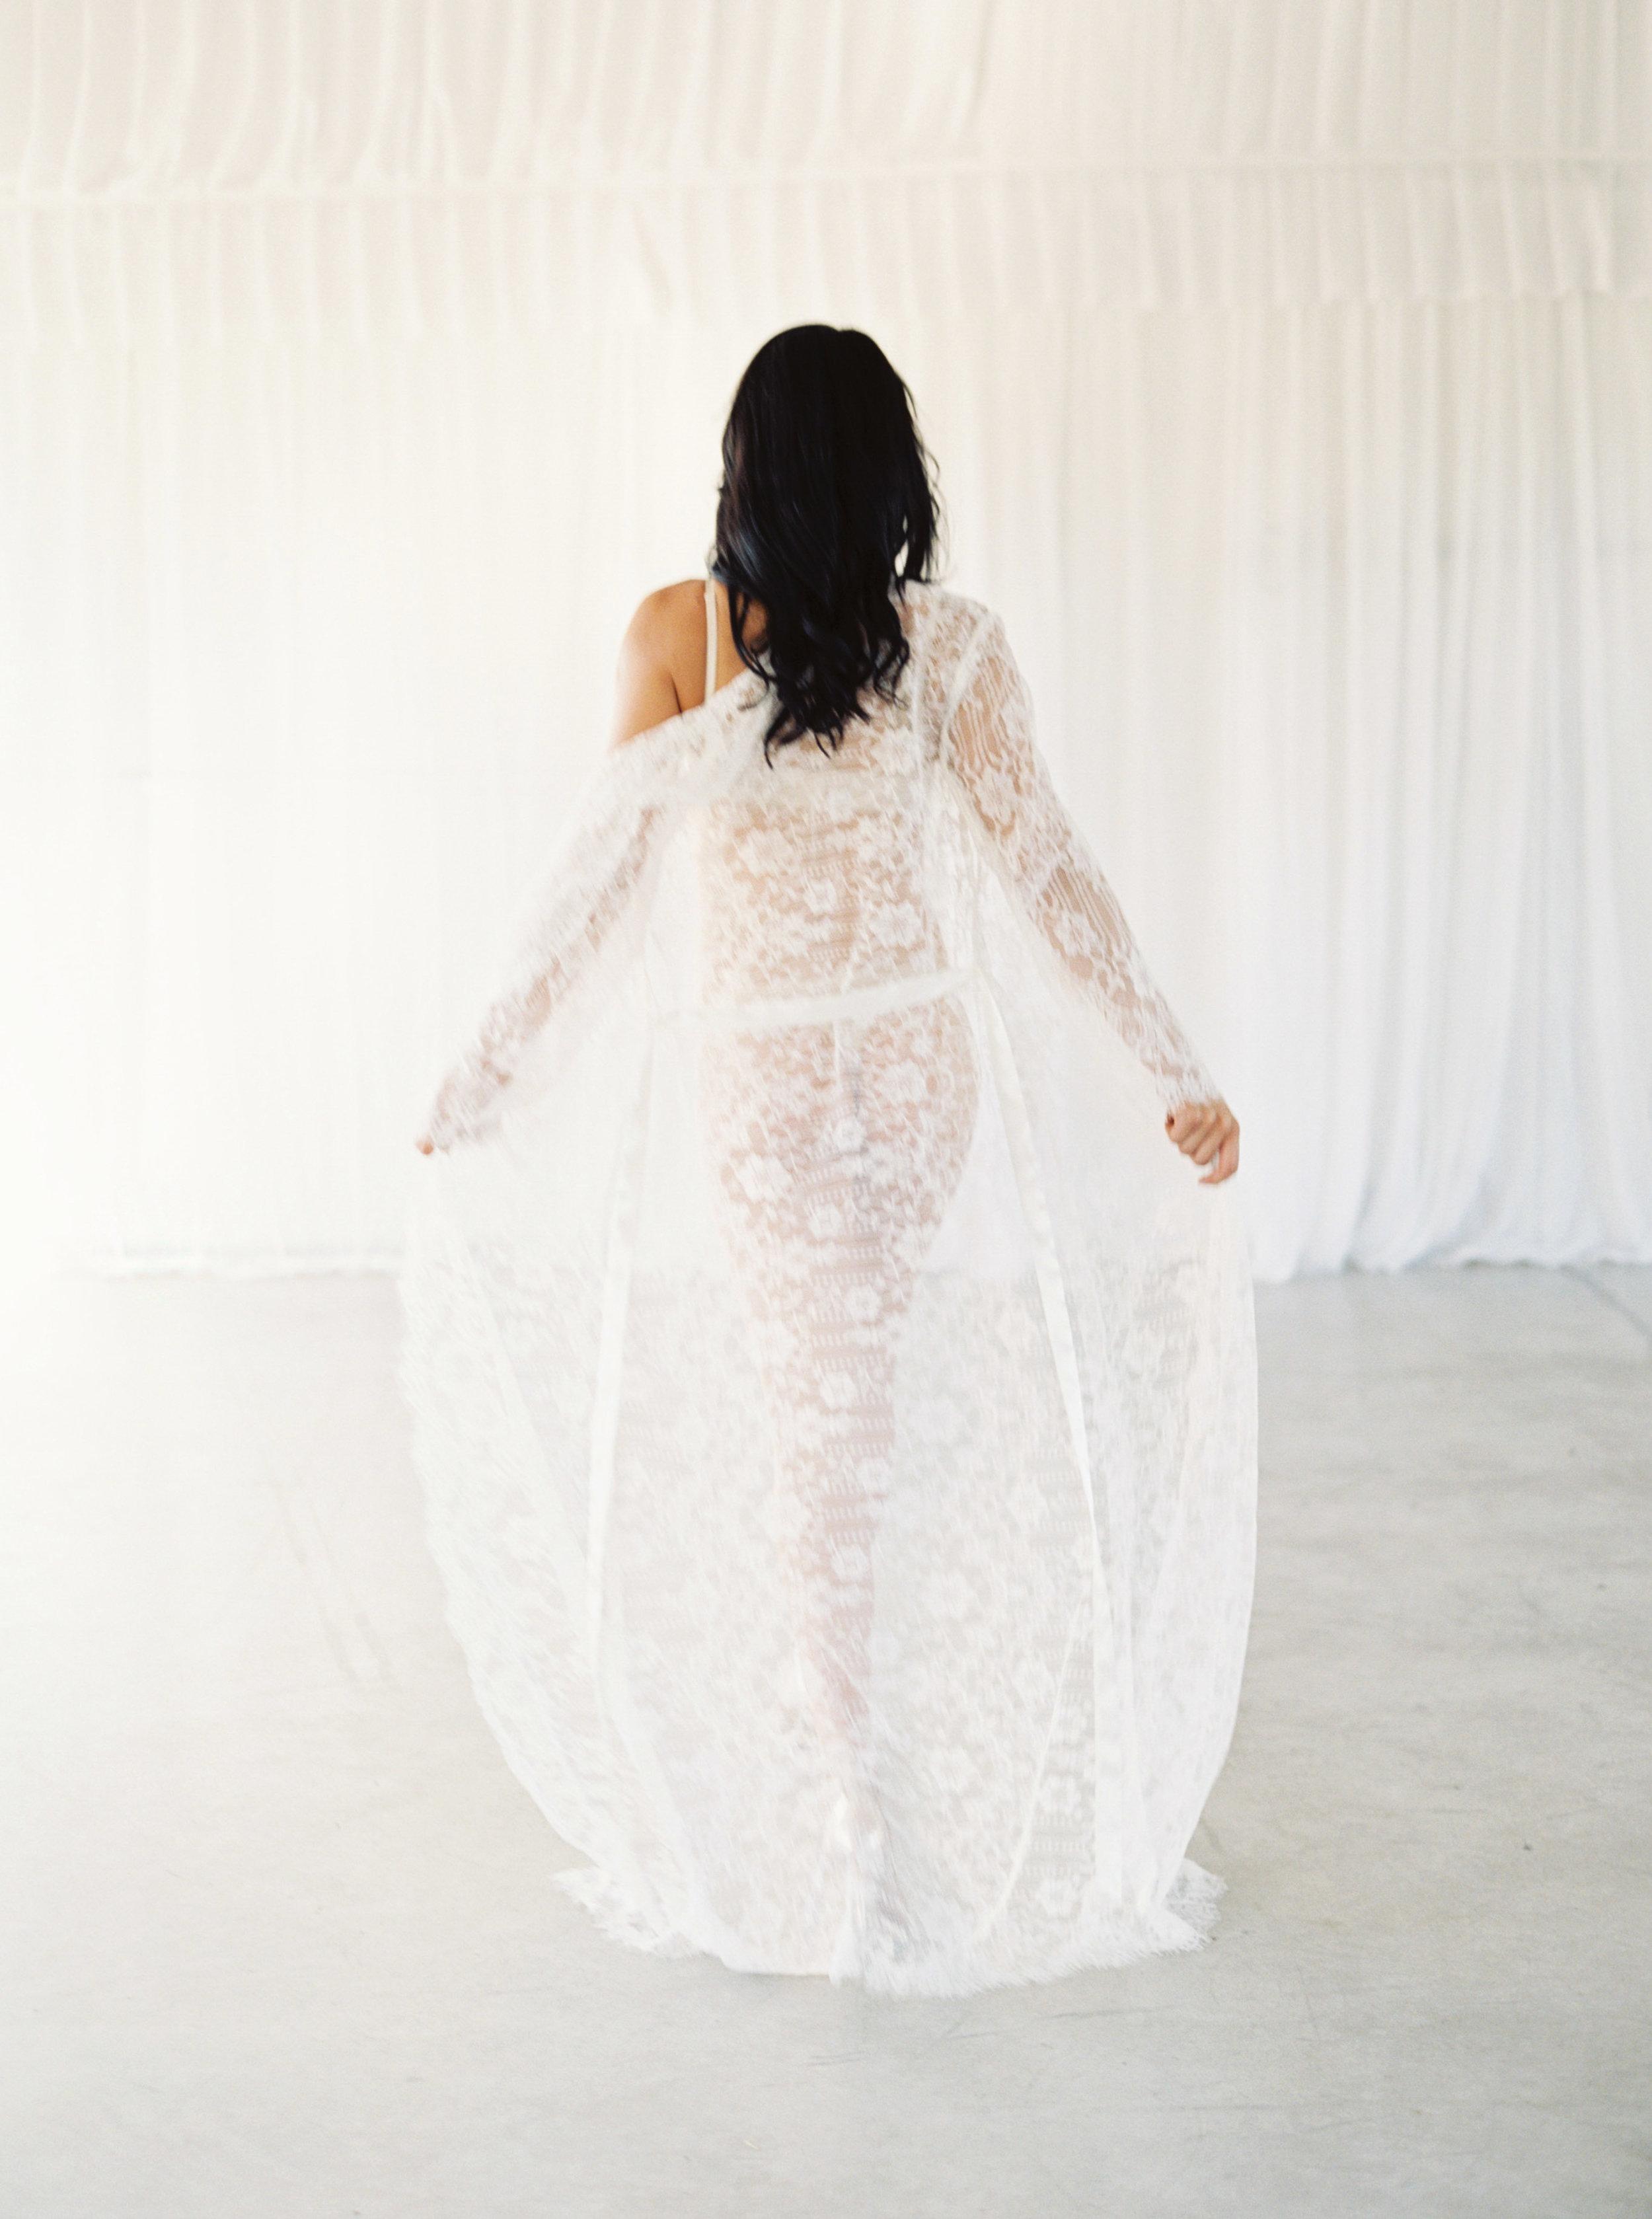 00001- Mudgee Wedding Photographer Sheri McMahon.jpg